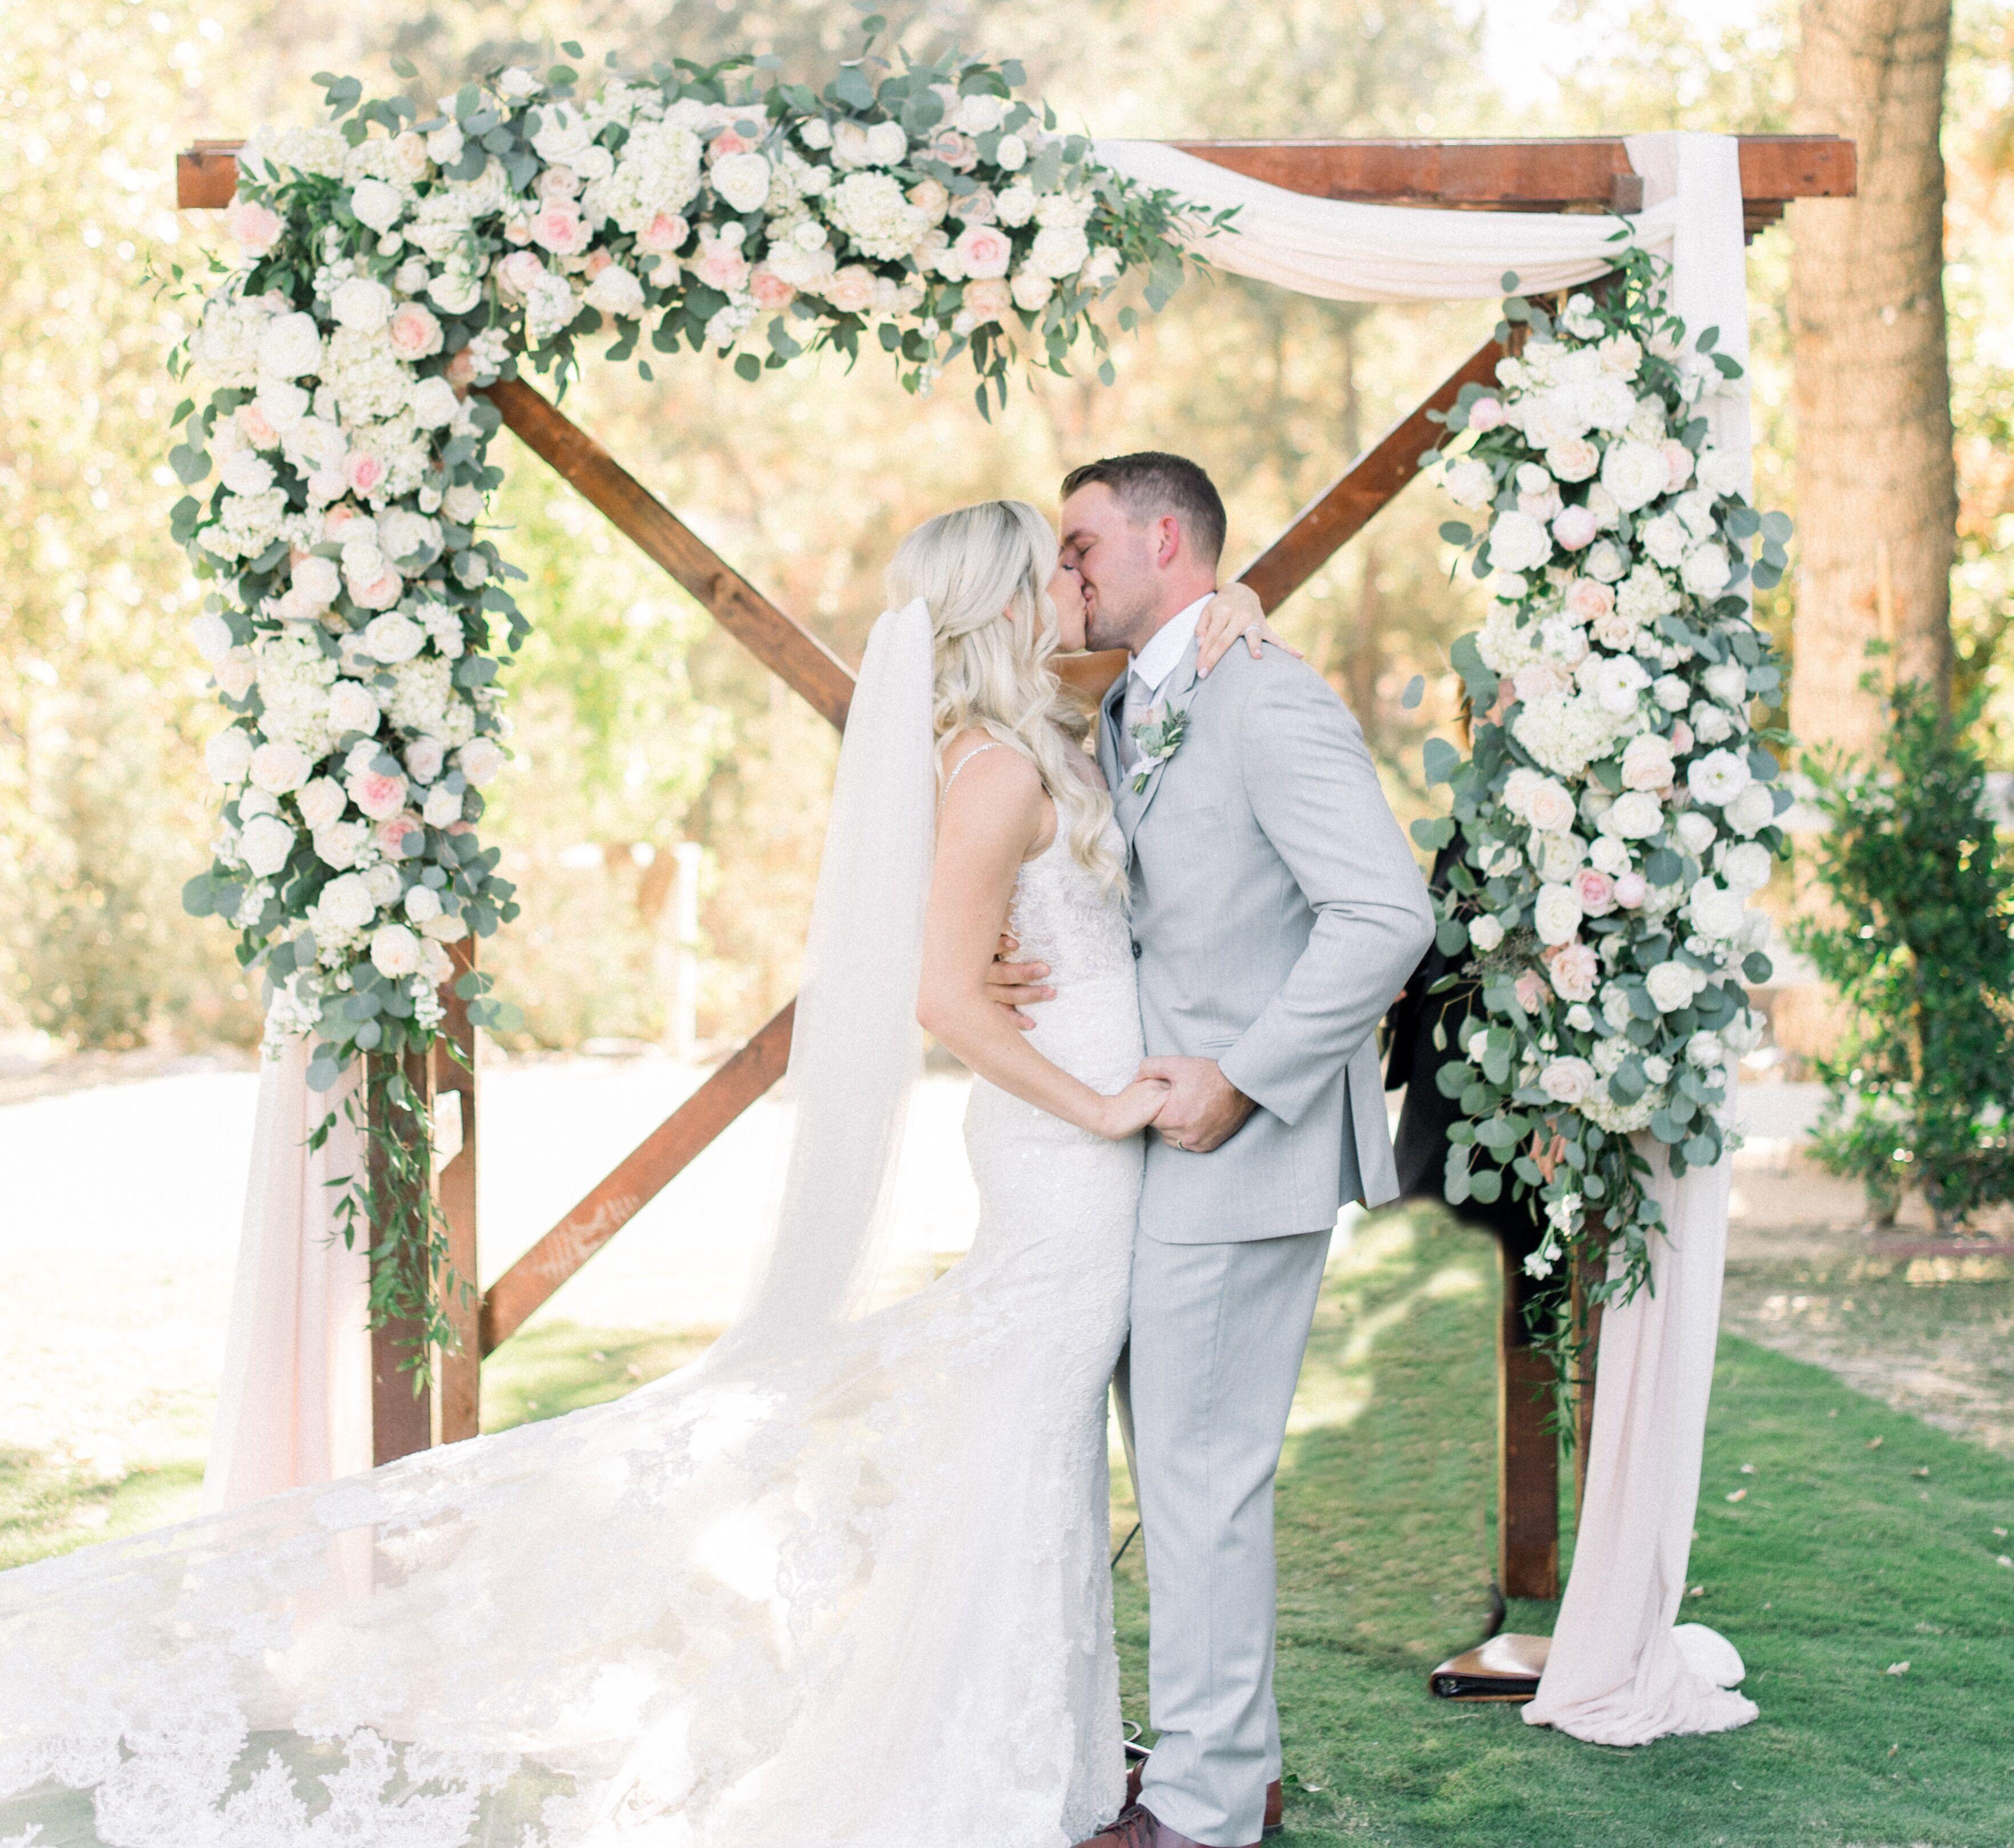 Wedding Planner Los Angeles: Wedding Planners - Los Angeles, CA